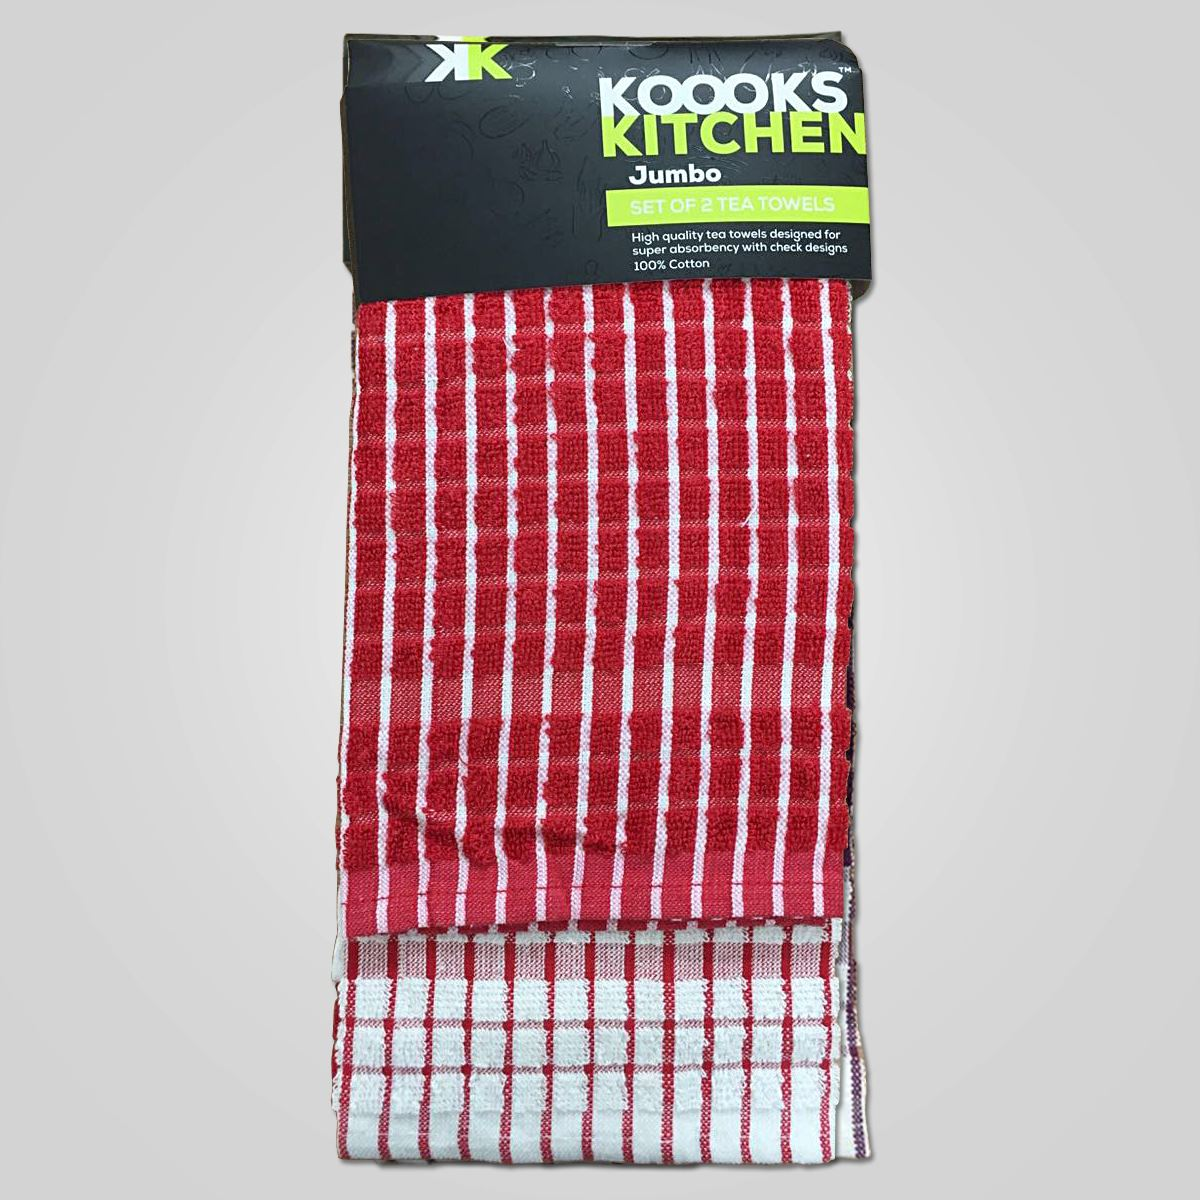 Quality Tea Towels Uk: High Quality Super Absorbent 100% Cotton Terry Tea Towels